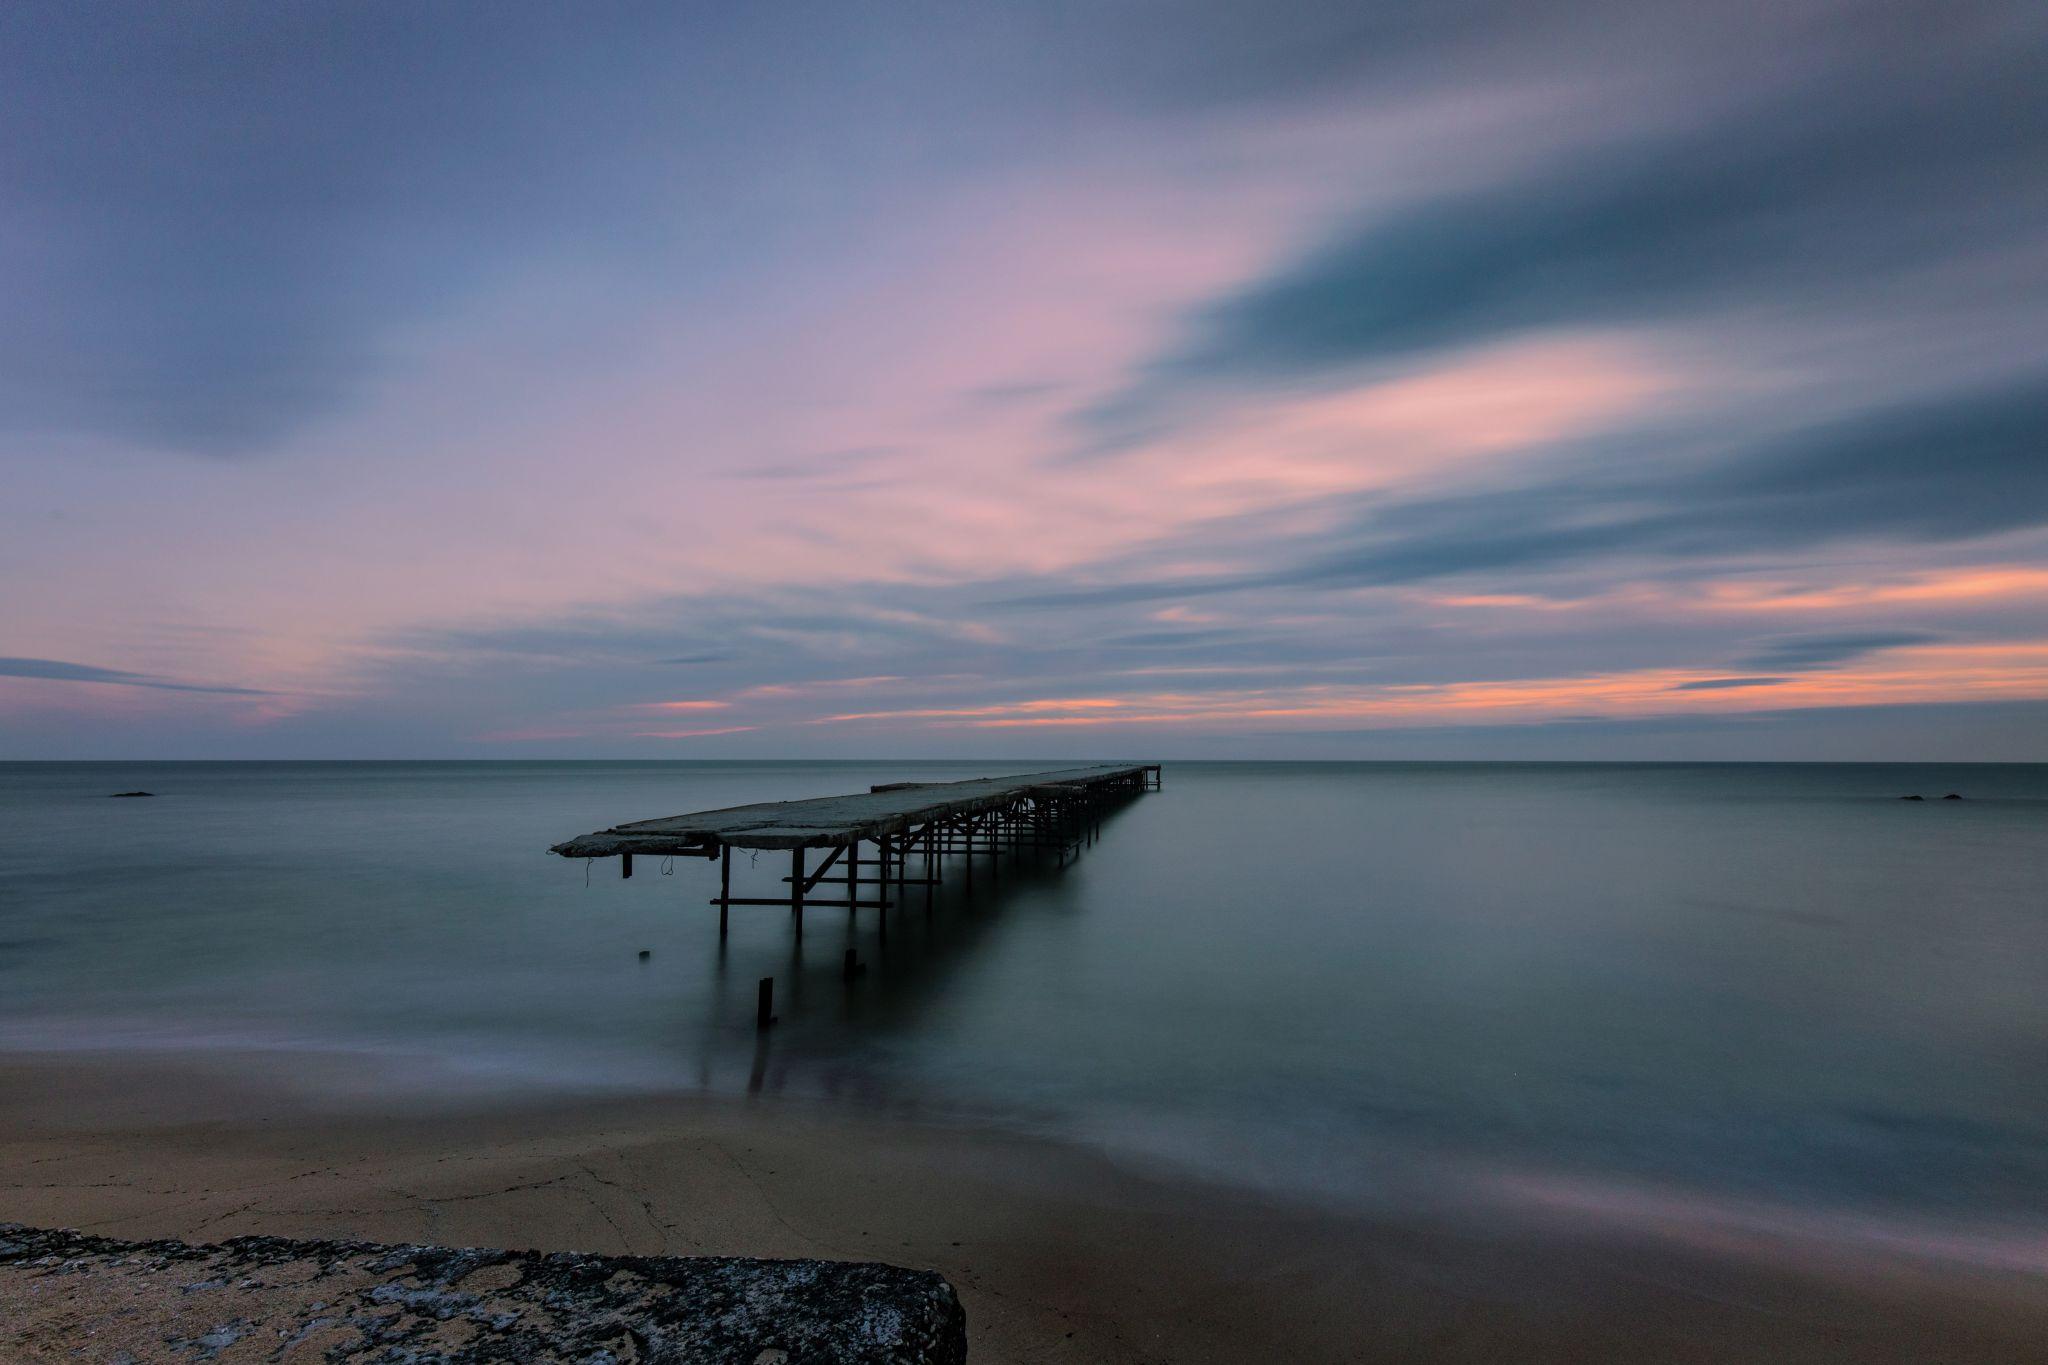 The broken pier, Bulgaria